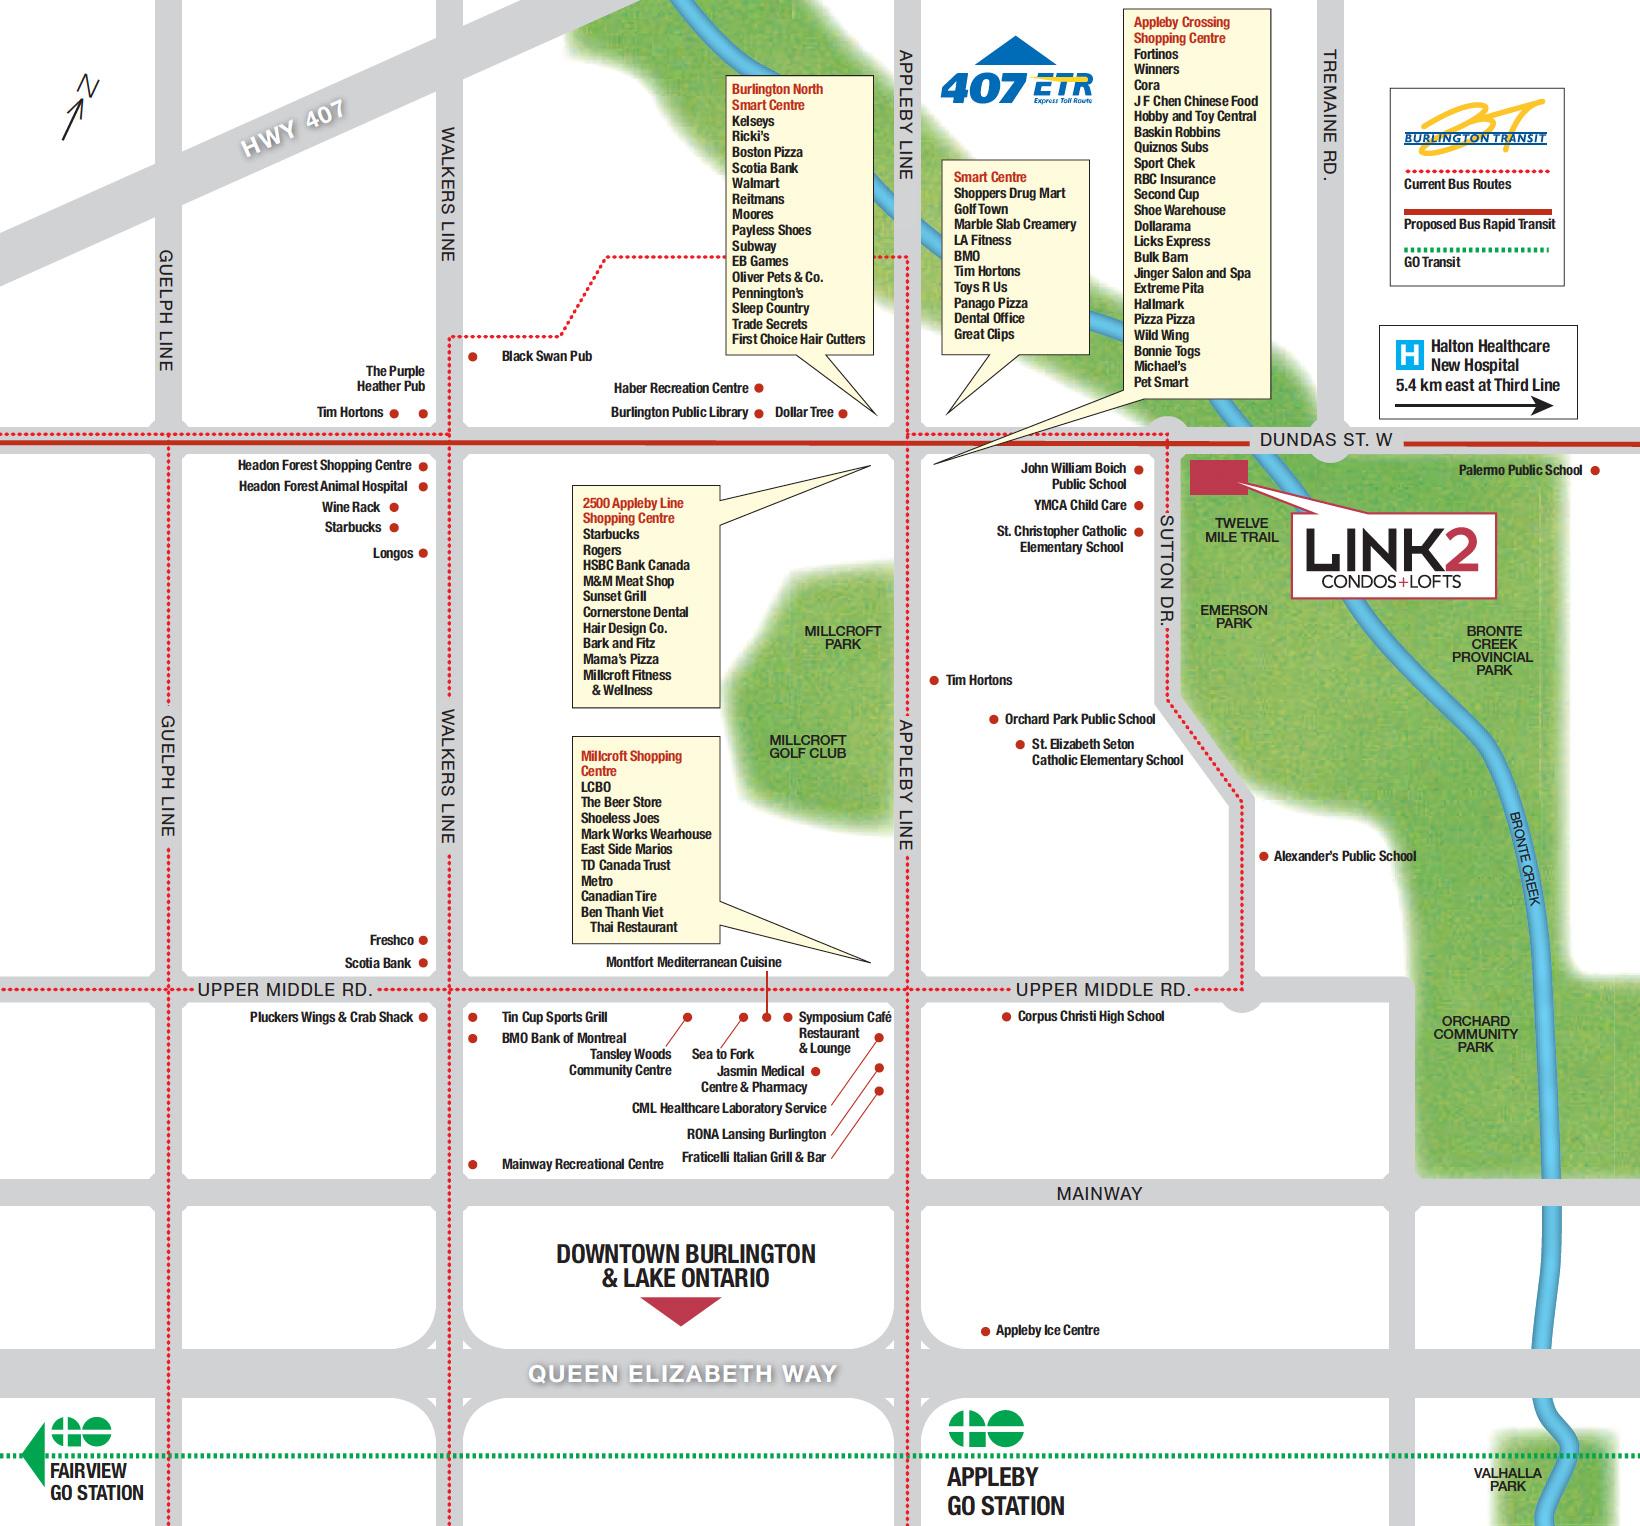 Link 2 Condos + Lofts — iRise Realty